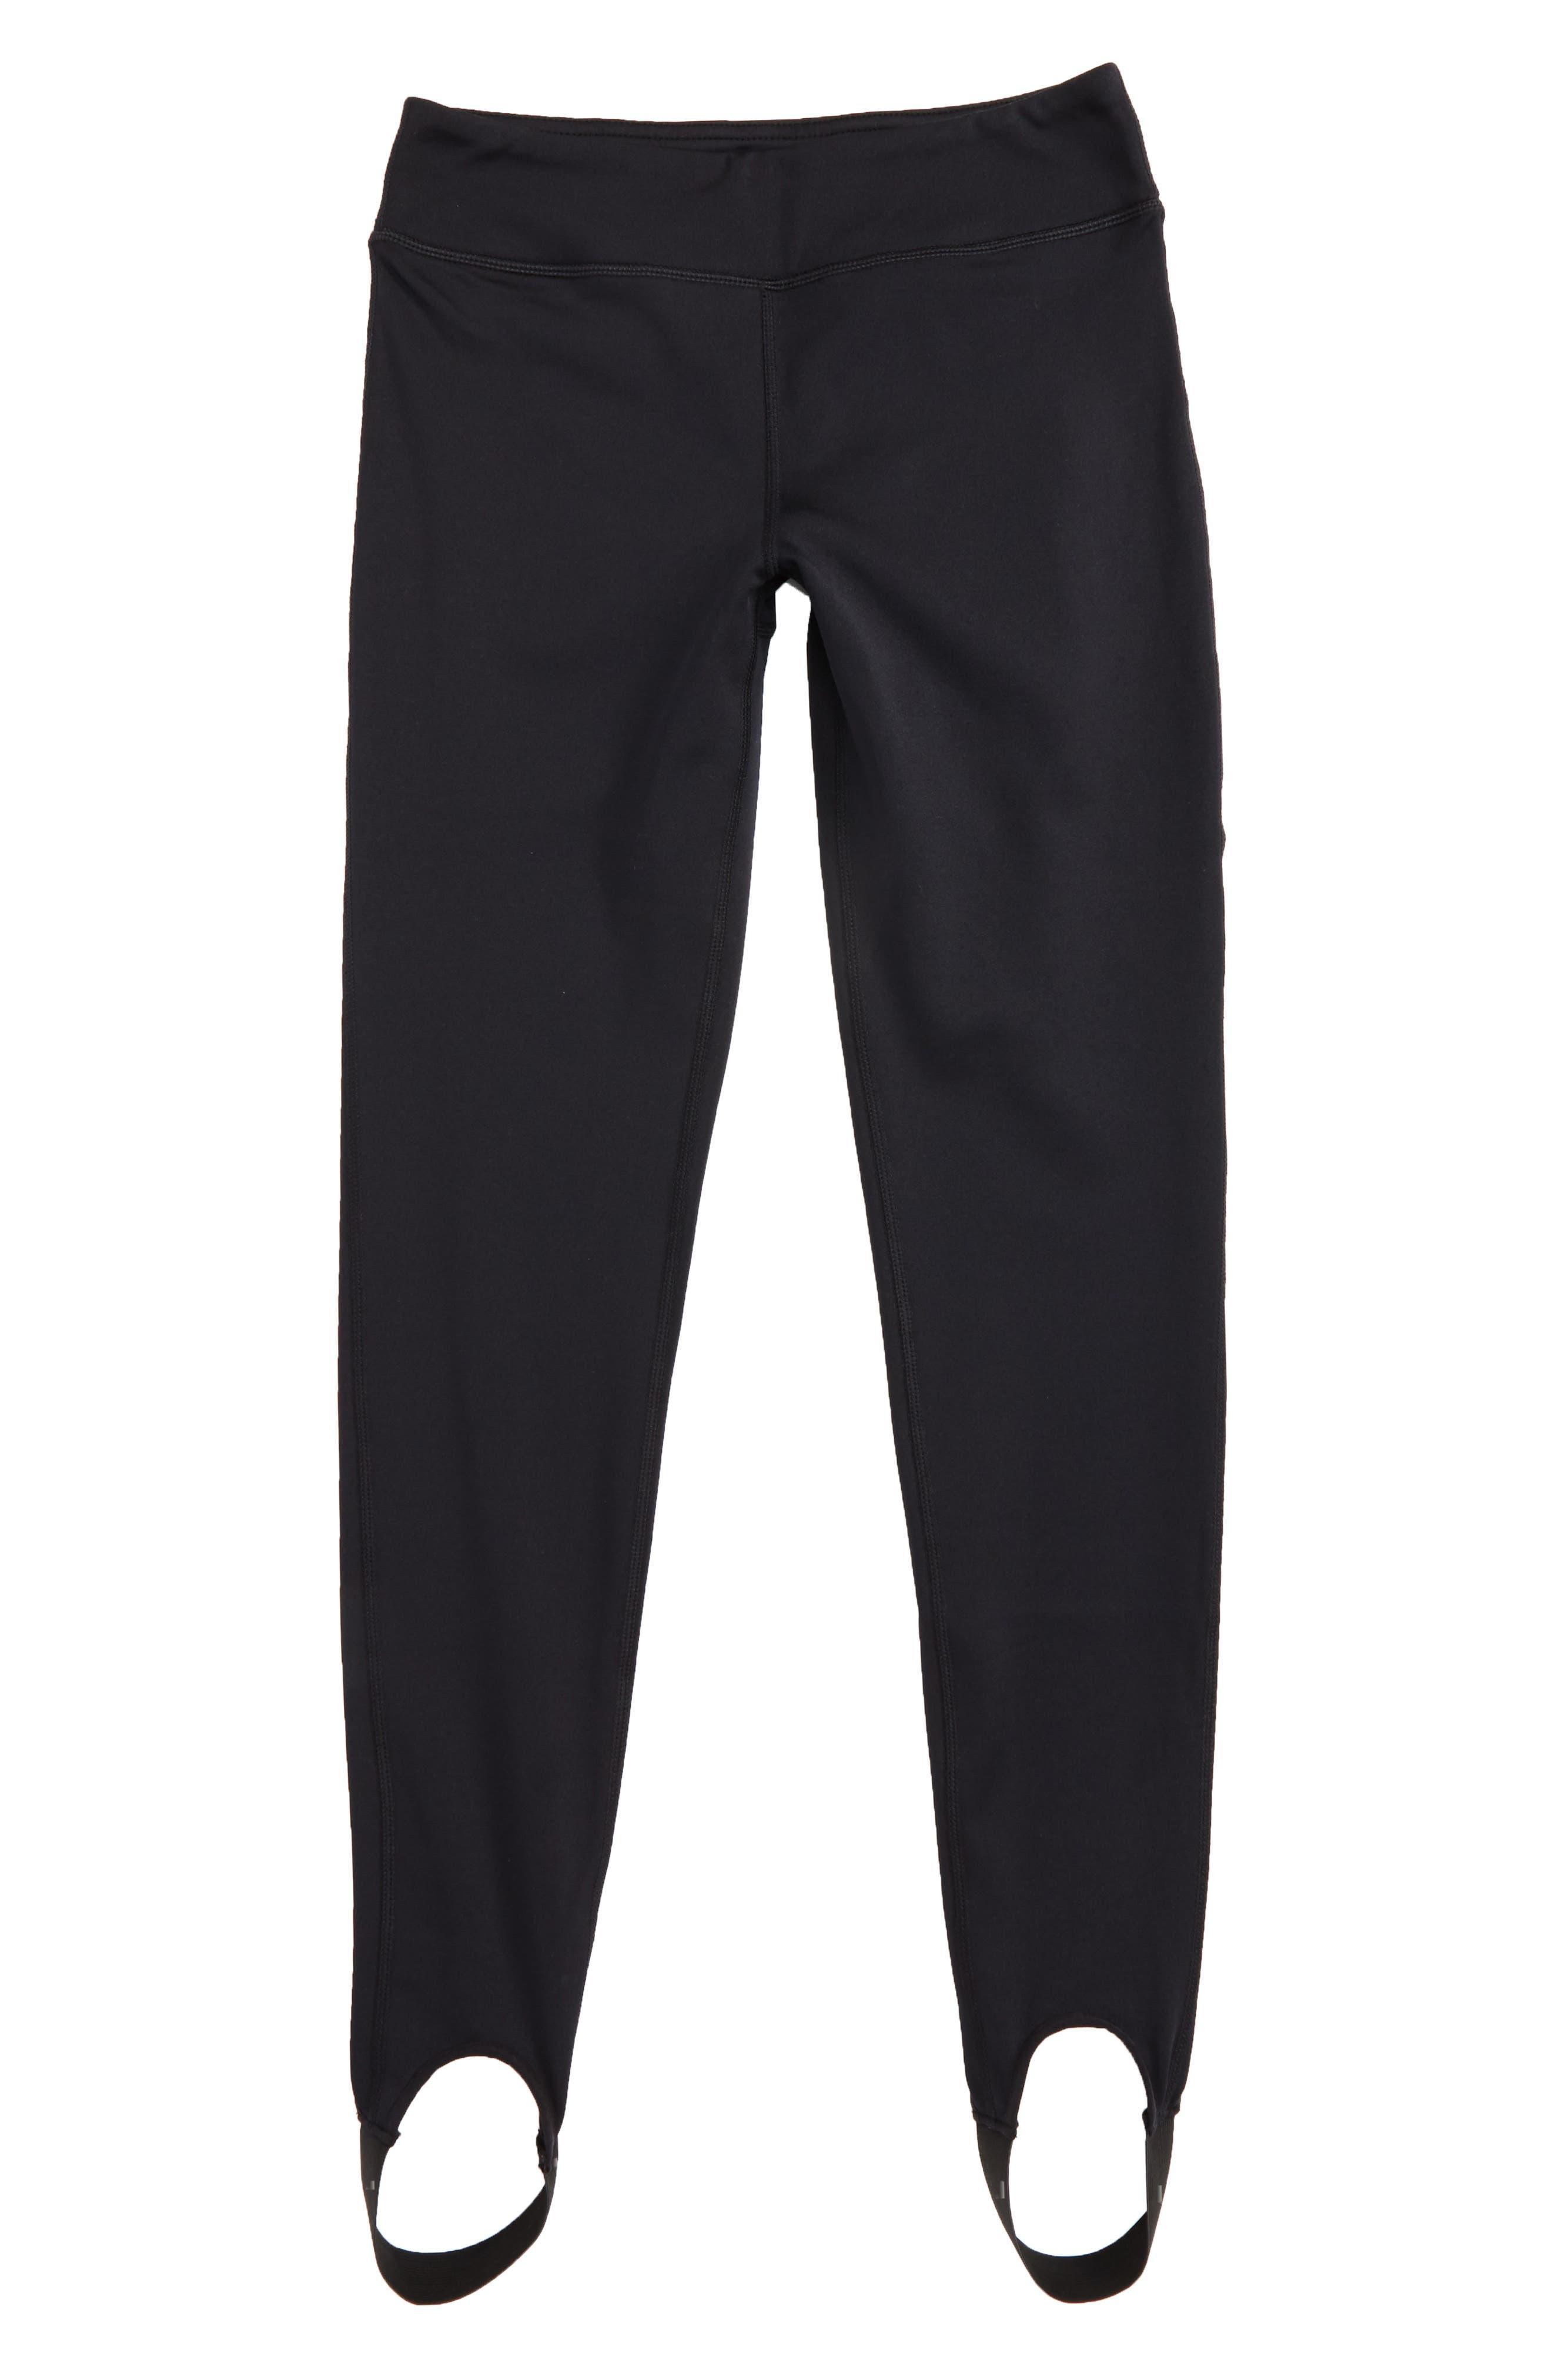 Stirrup Leggings,                         Main,                         color, Black